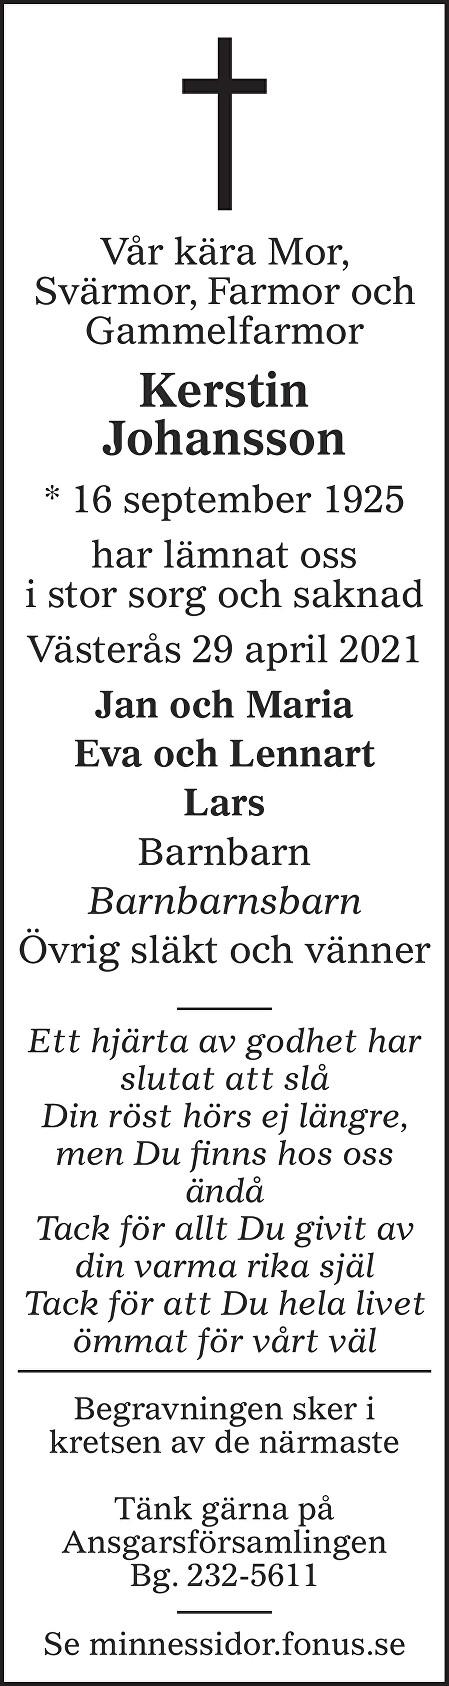 Kerstin Johansson Death notice